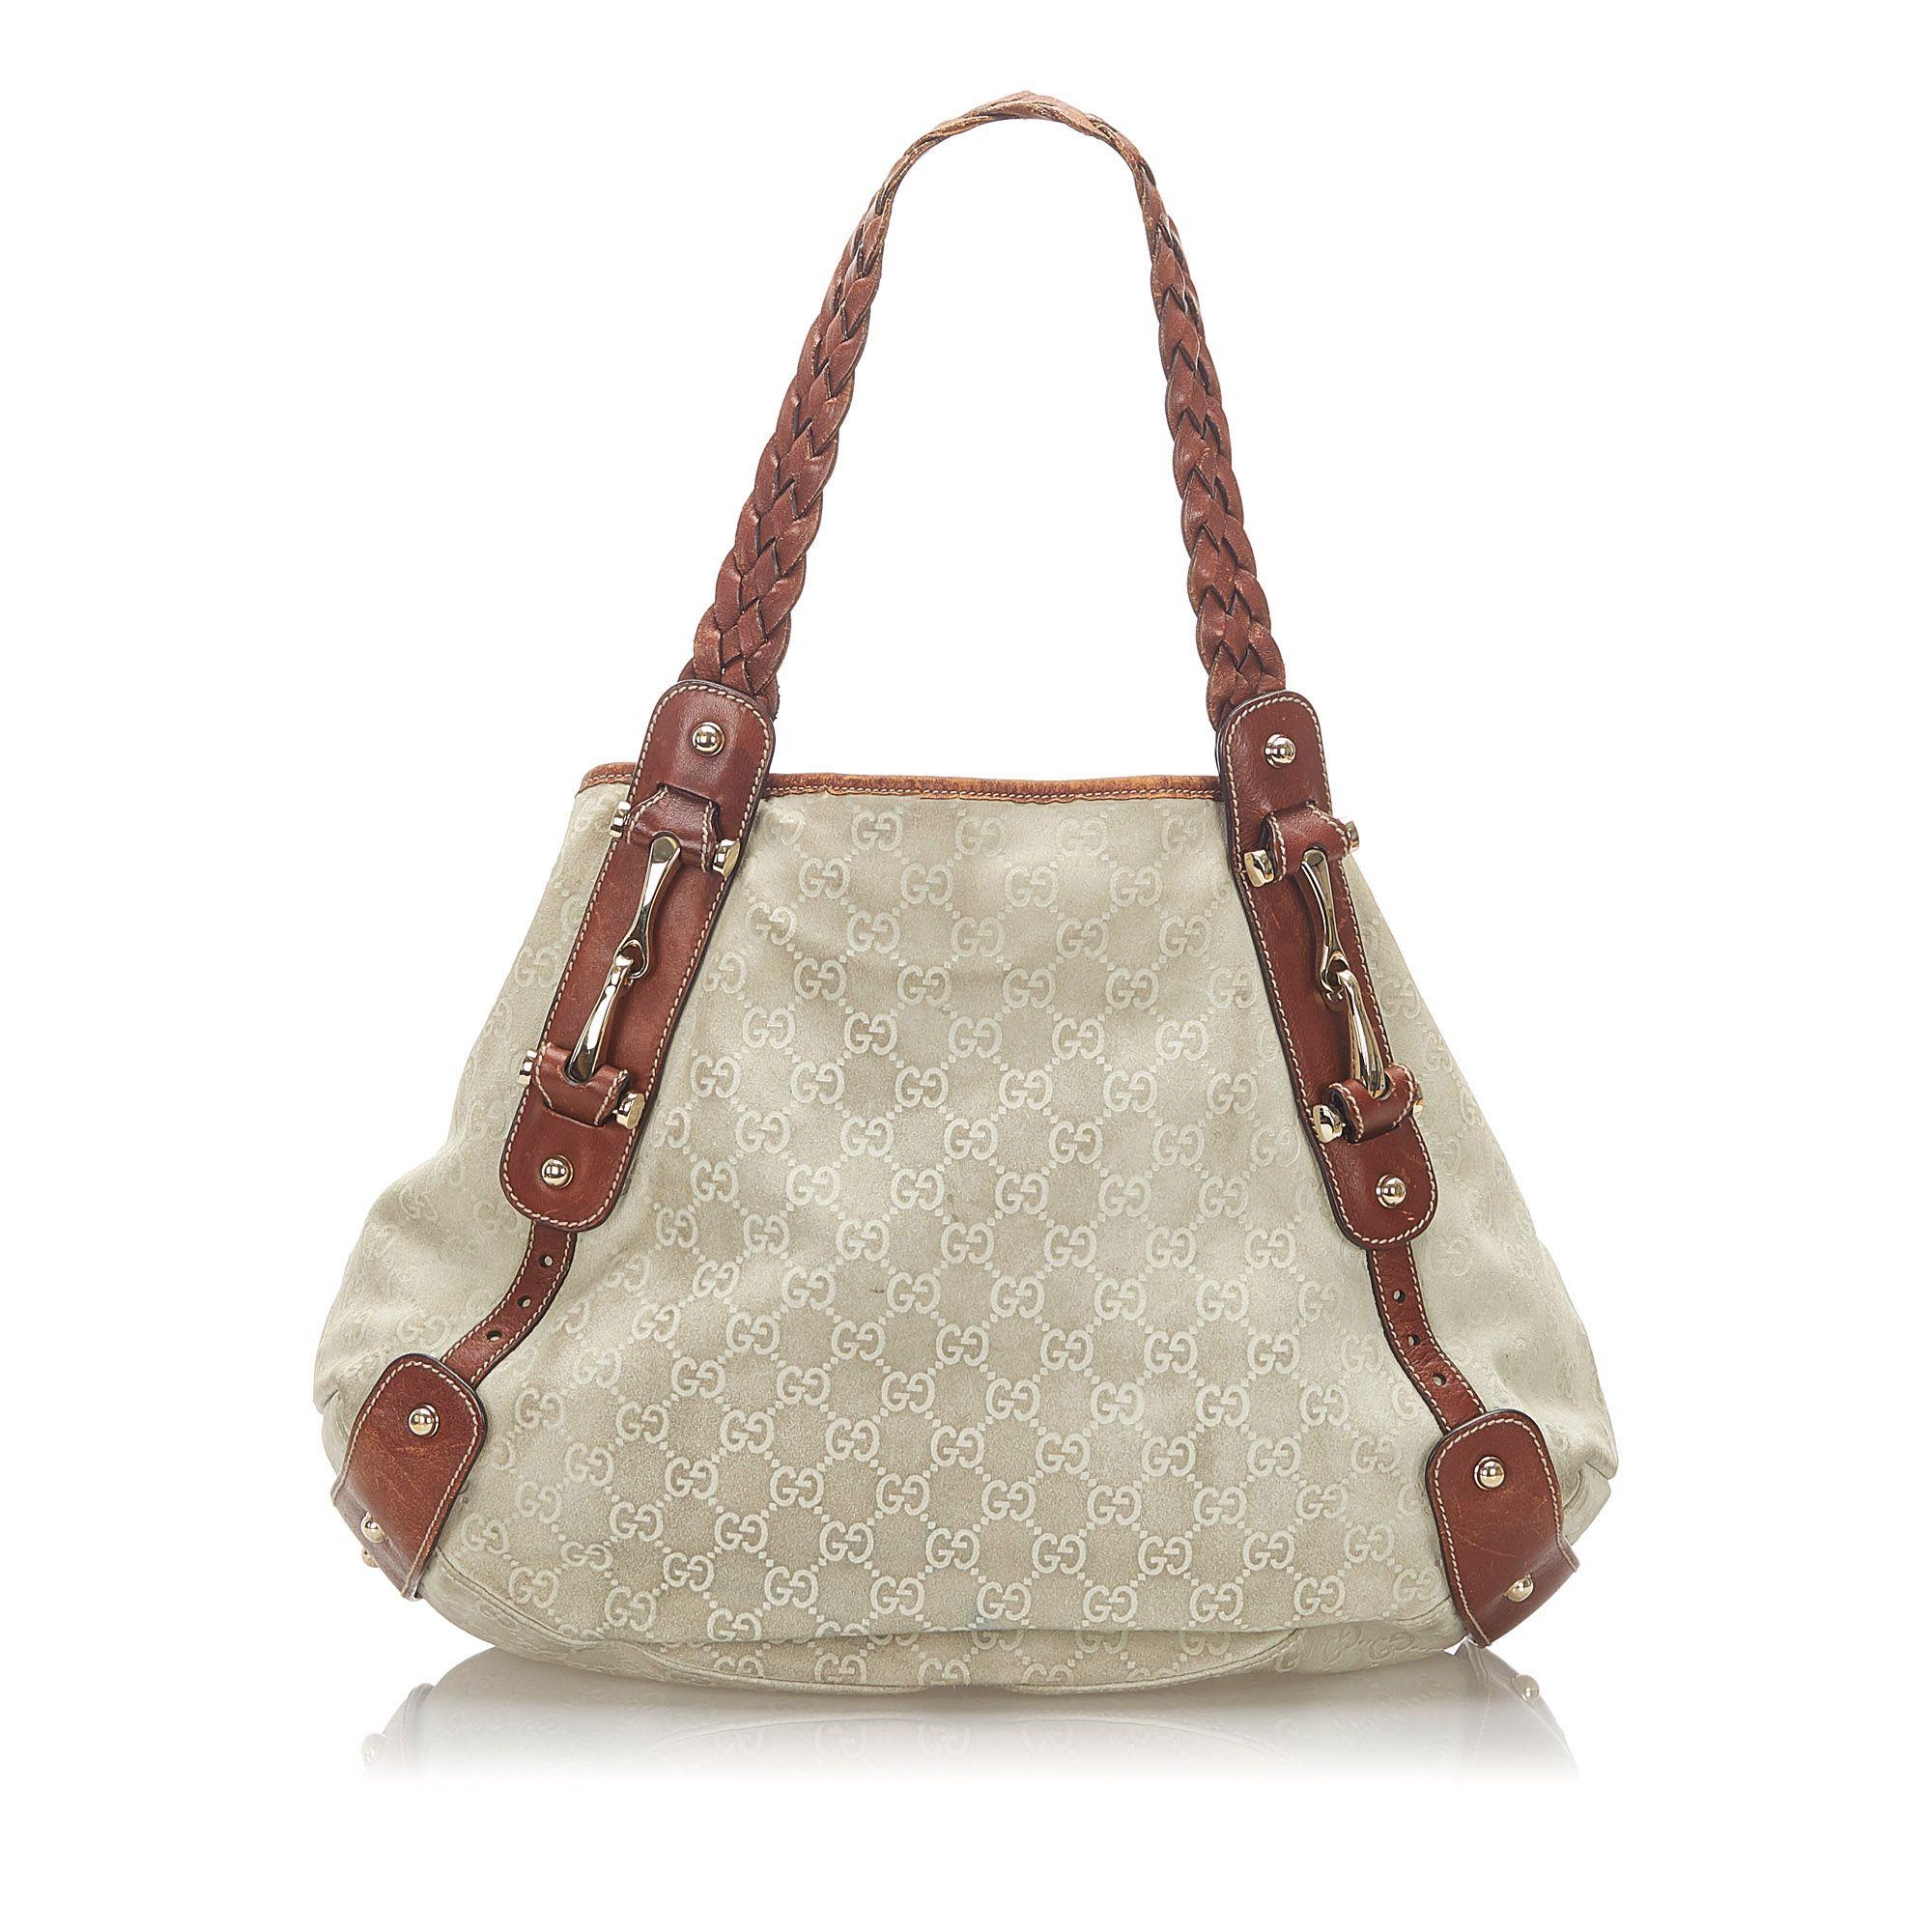 Vintage Gucci GG Canvas Pelham Shoulder Bag Brown